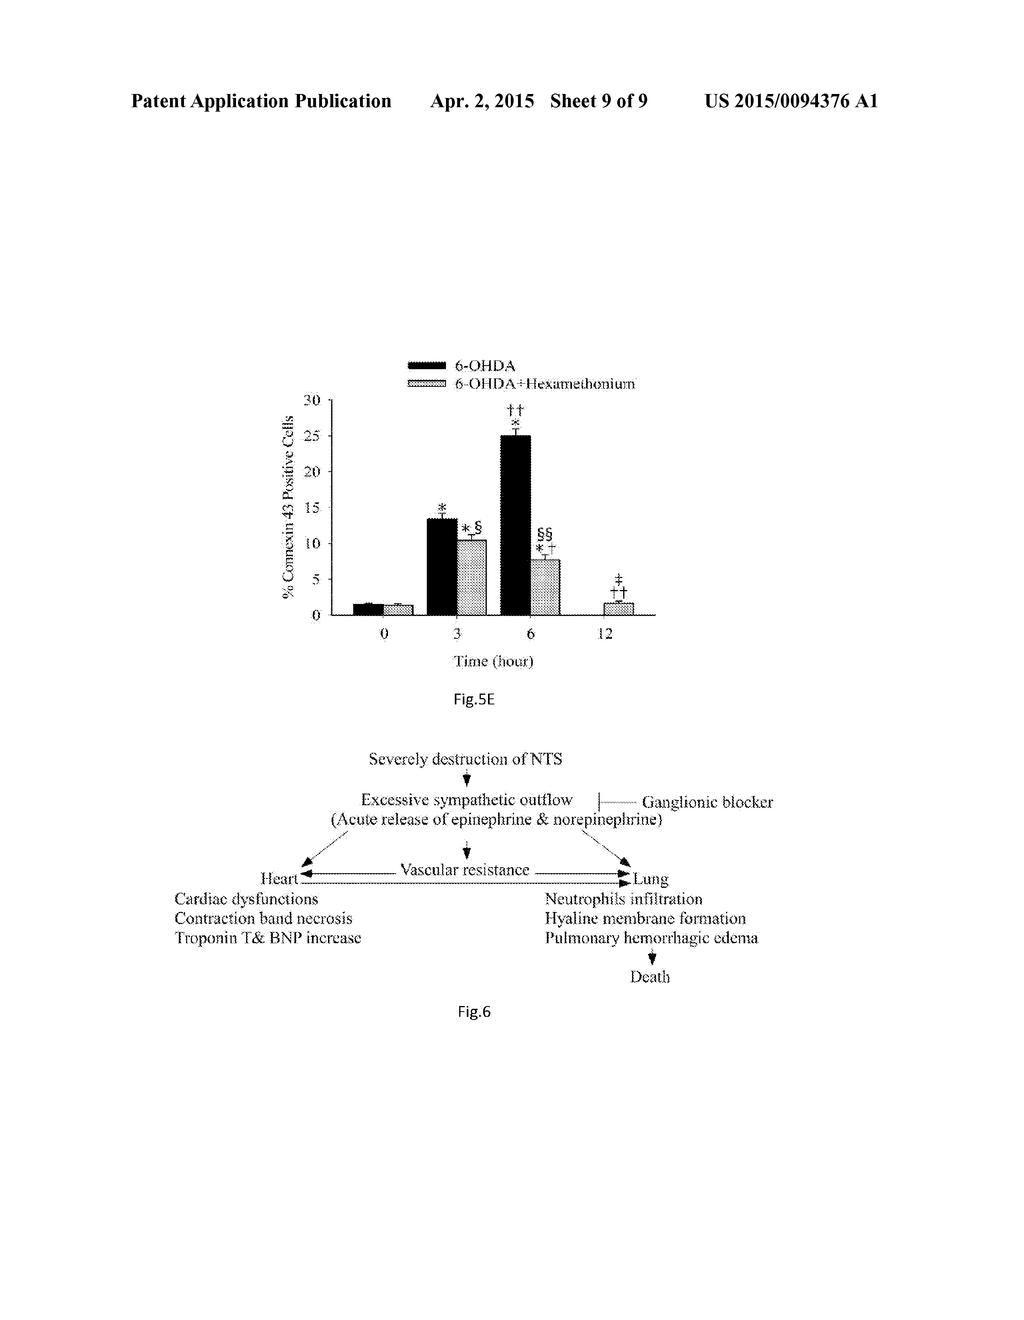 hight resolution of hexamethonium reverses the lethal cardiopulmonary damages in a rat model of brain stem lesions mimicking fatal enterovirus 71 encephalitis diagram